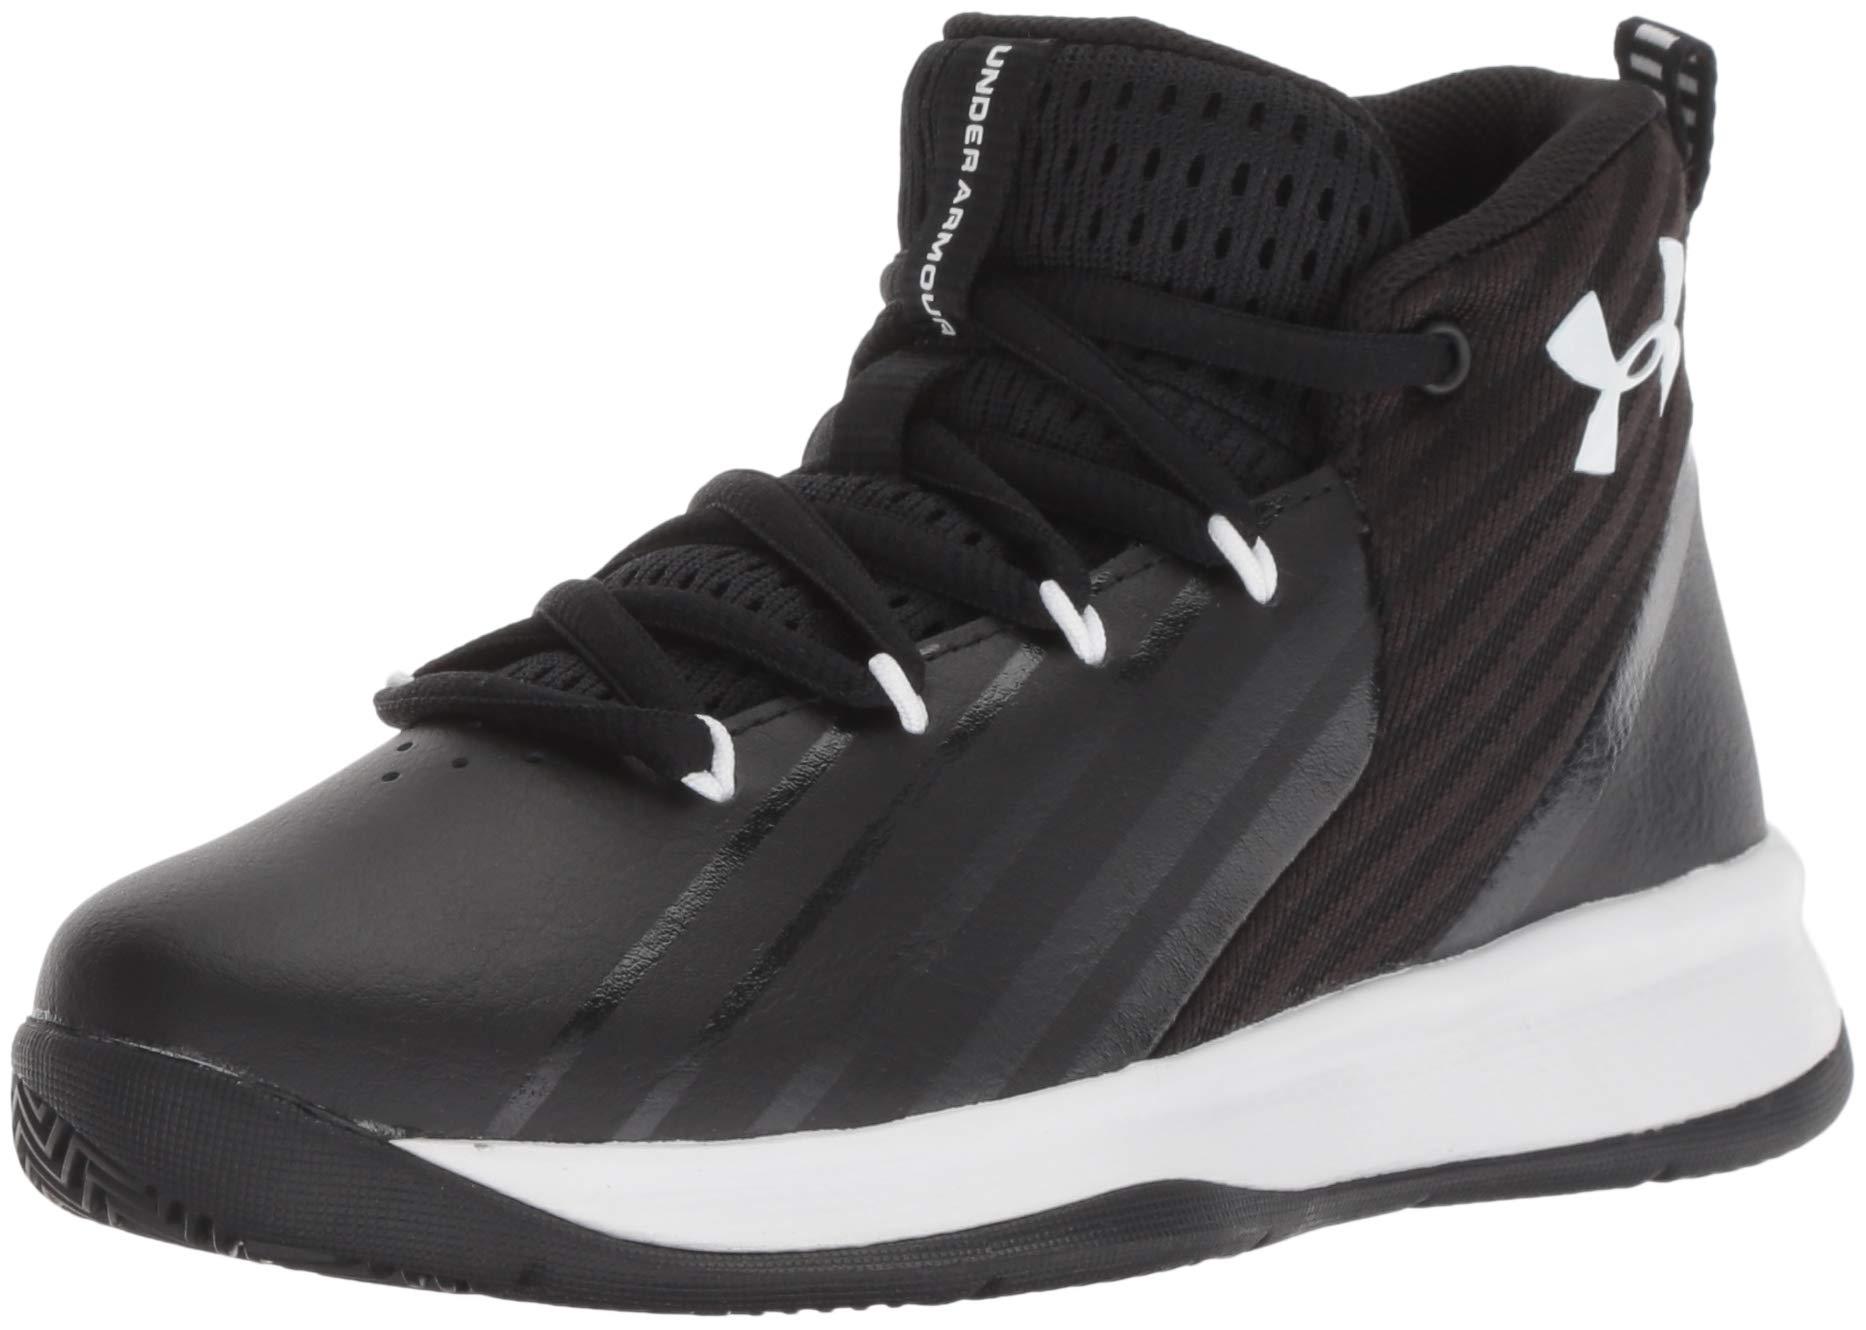 Under Armour Boys' Pre School Launch Basketball Shoe, Black (002)/White, 2